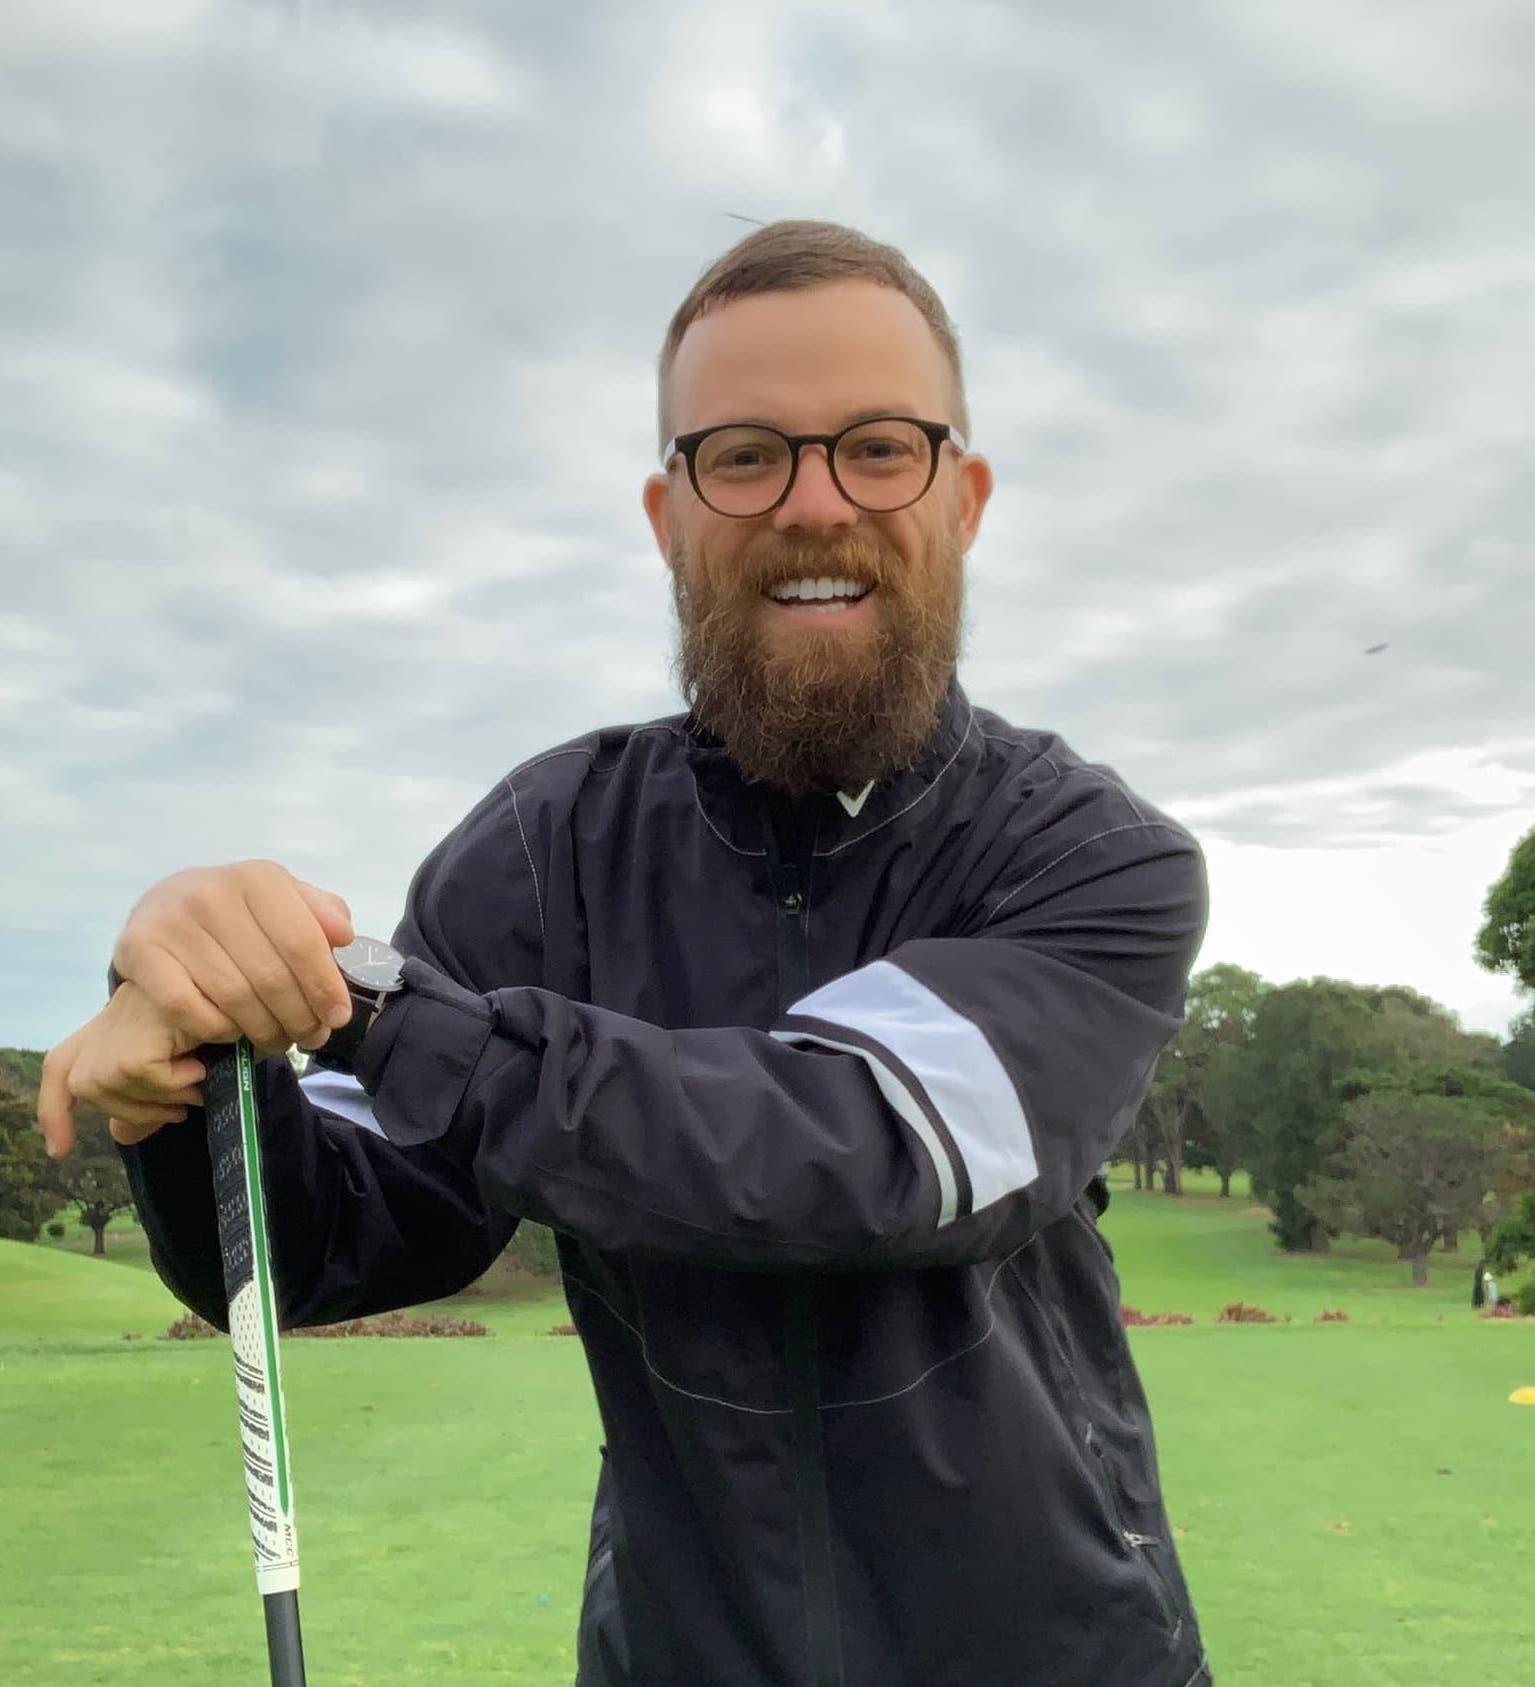 Toby McGeachie, PGA Professional Coach in Kiama